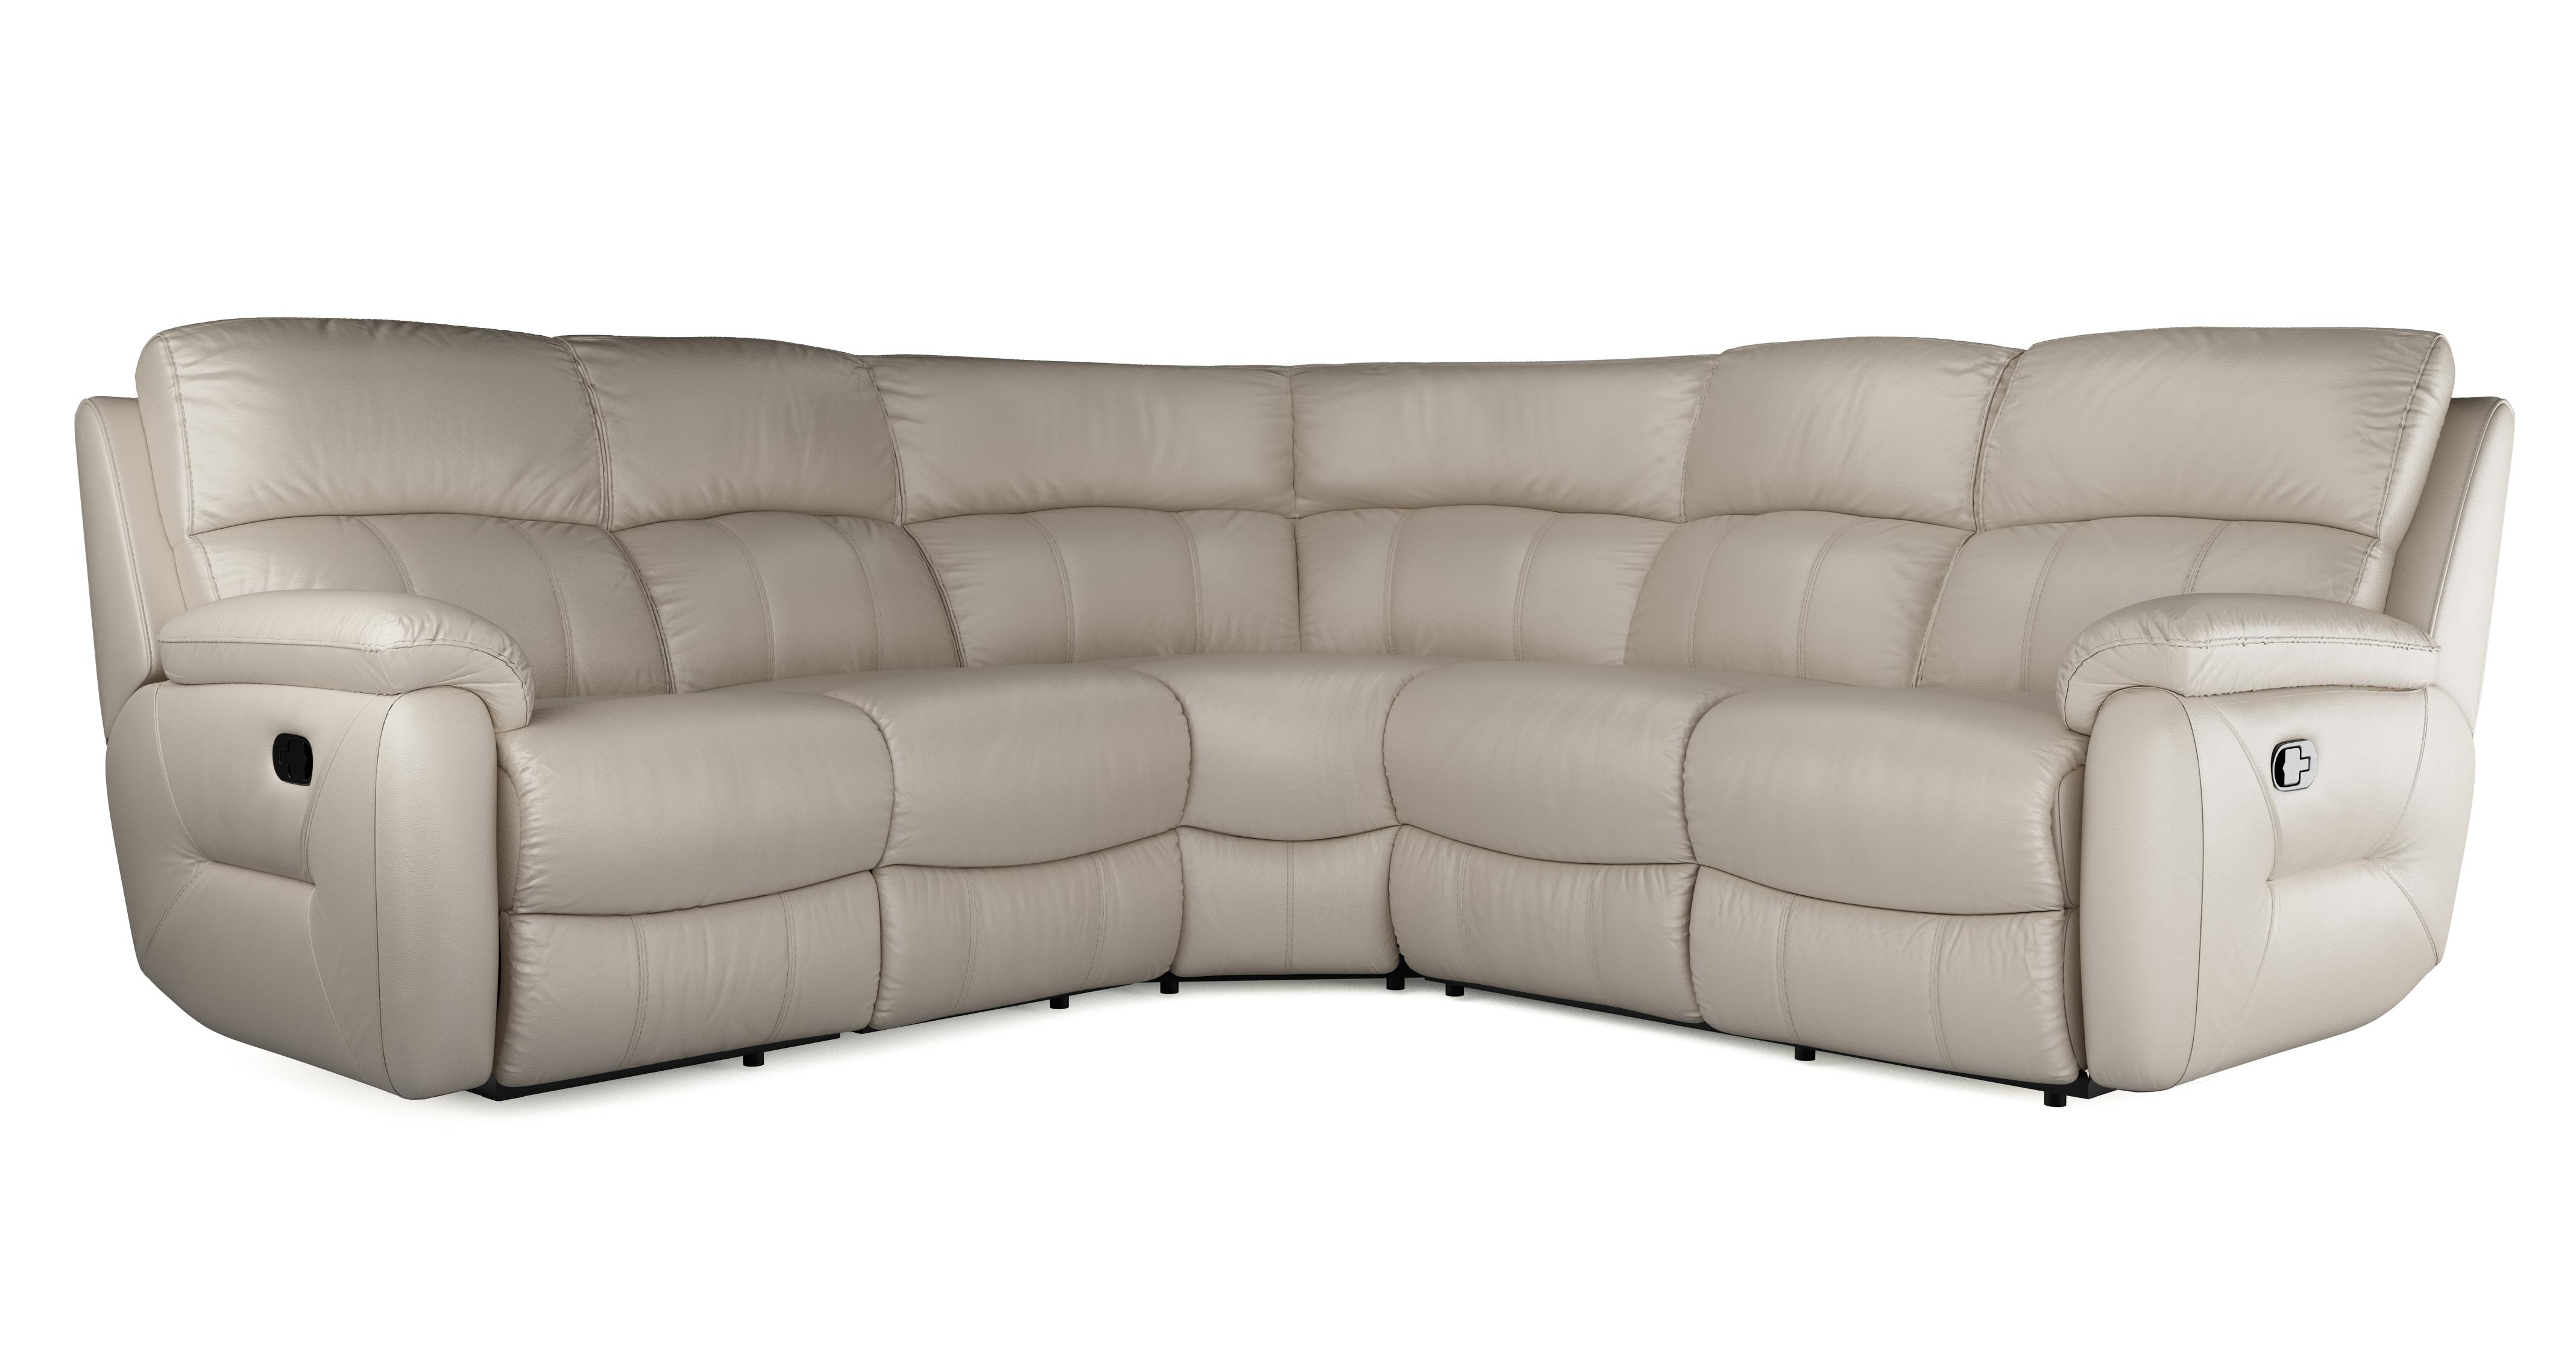 dfs navona sofa reviews ikea white leather corner gradschoolfairs